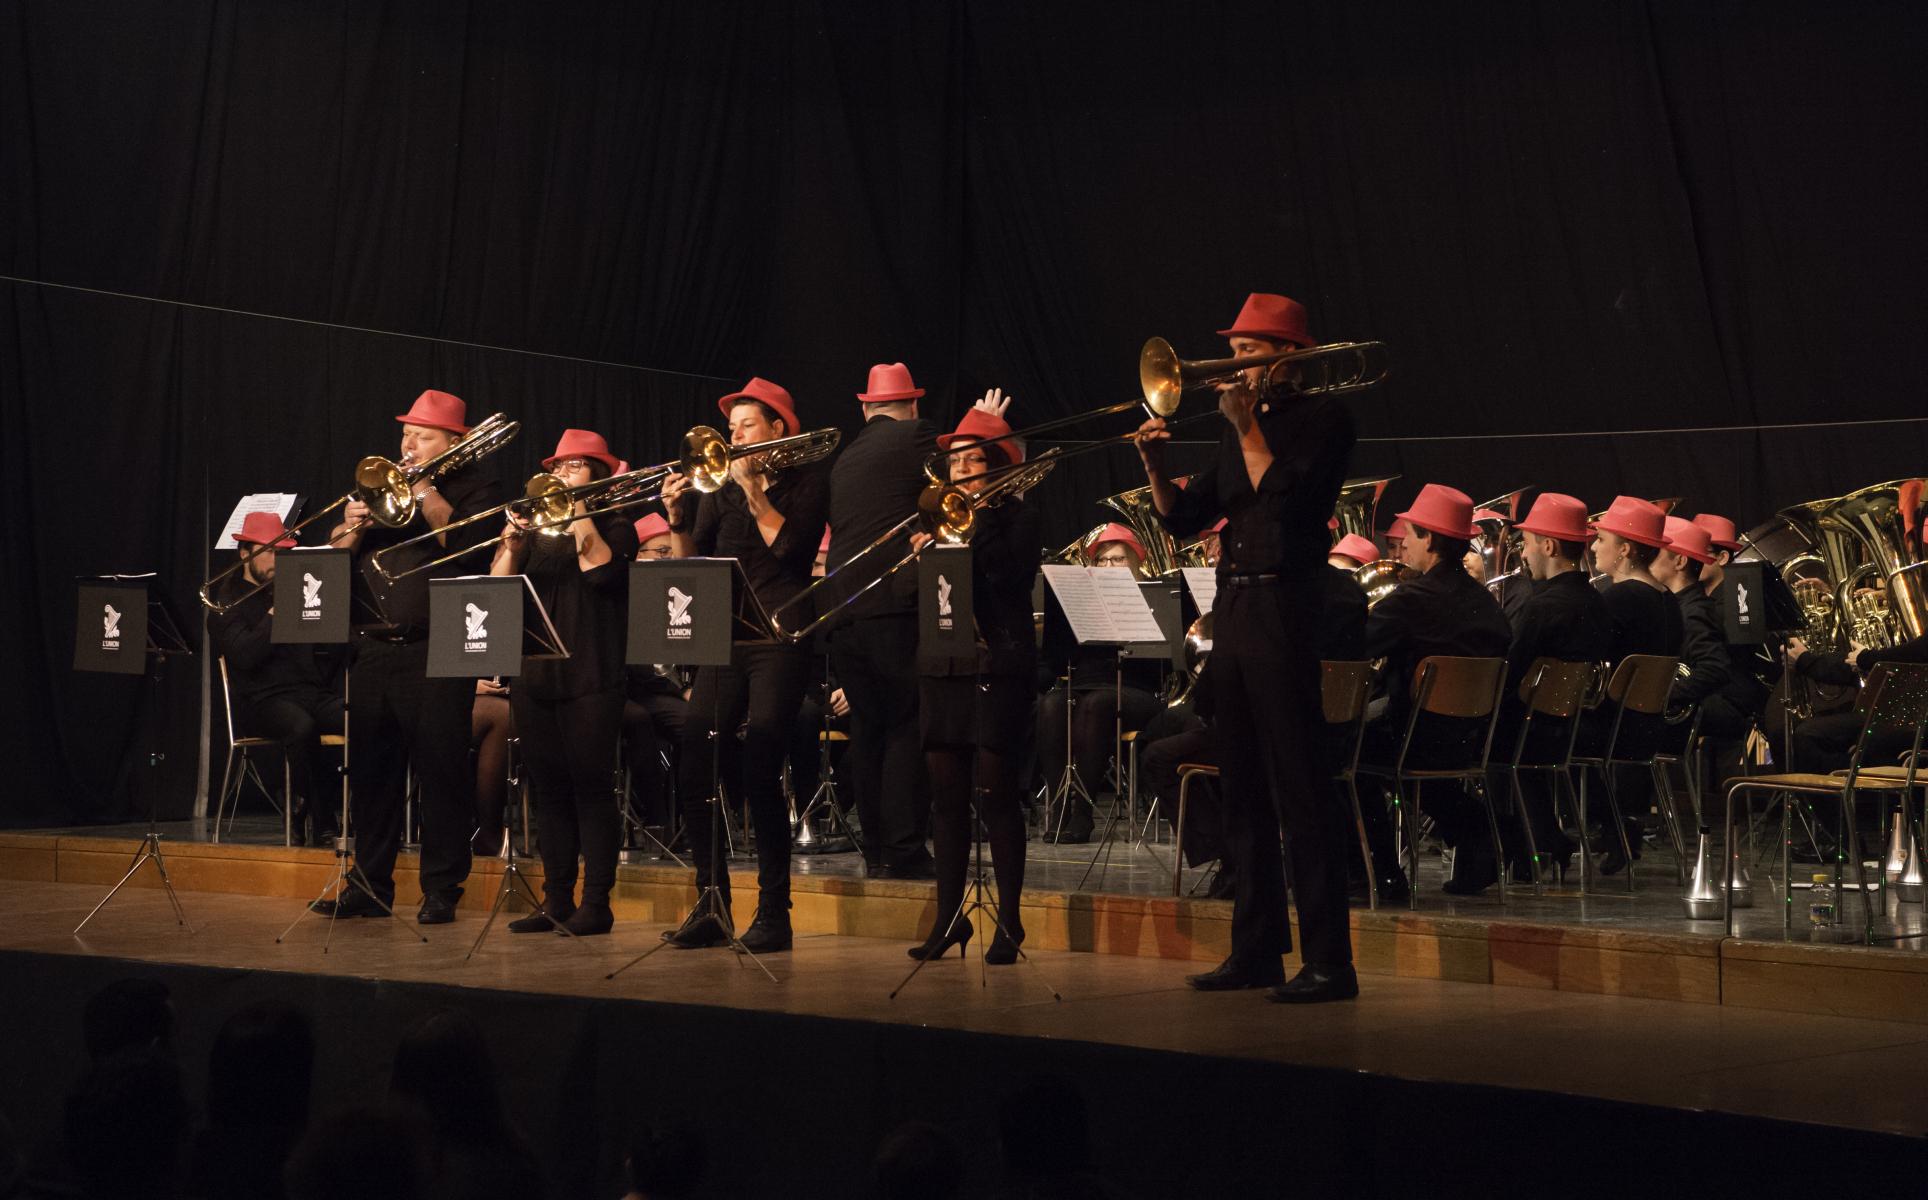 170211_concert_annuel17-067